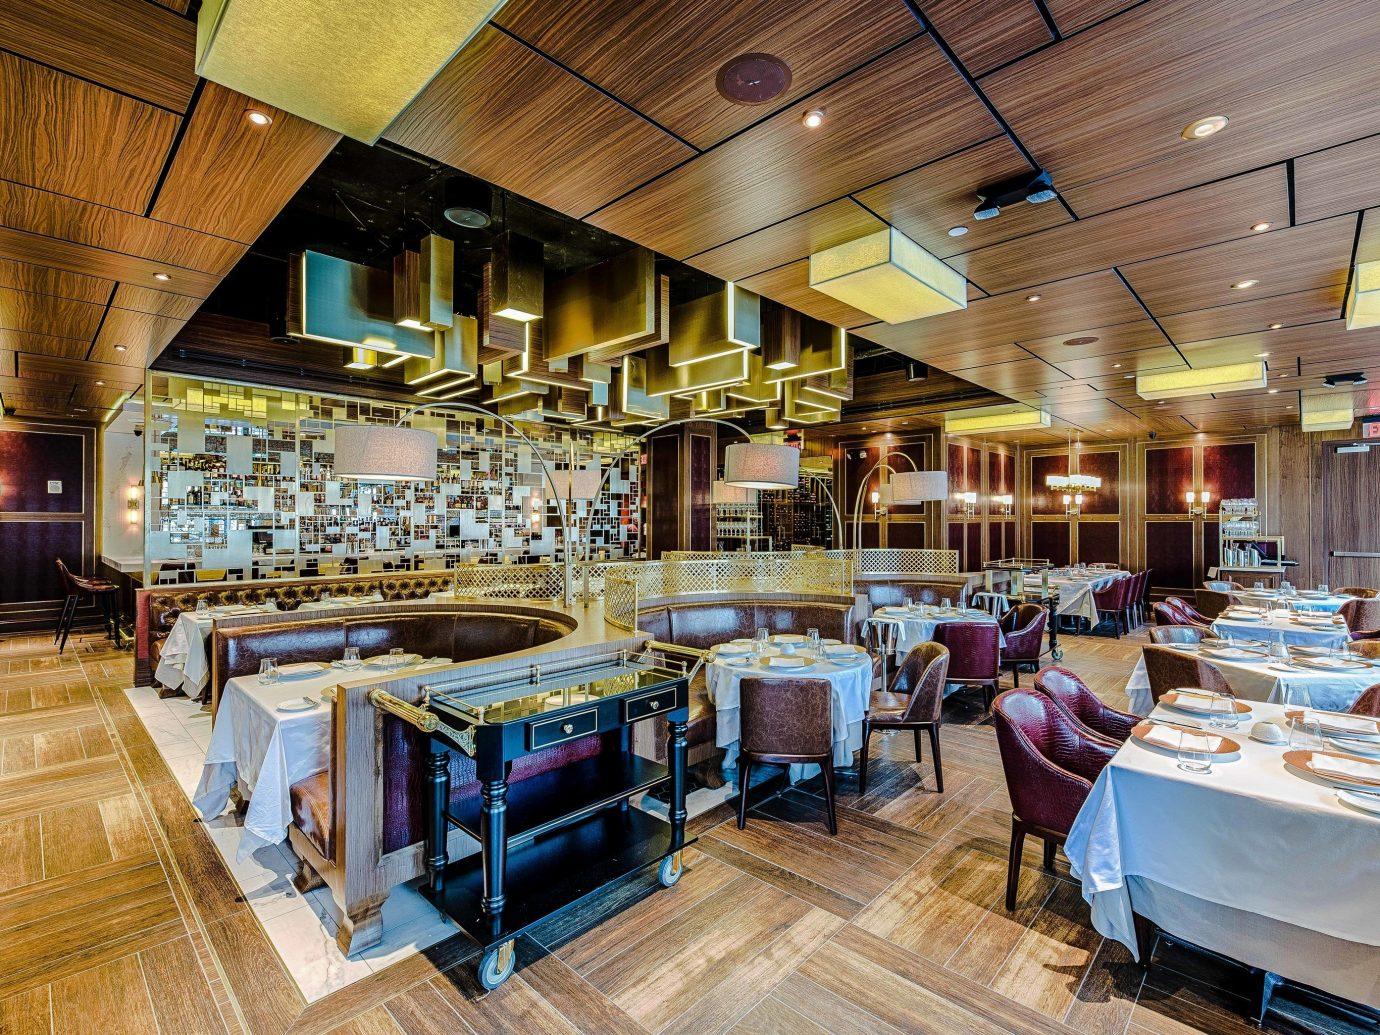 Trip Ideas Weekend Getaways ceiling indoor floor room restaurant estate interior design meal Lobby café